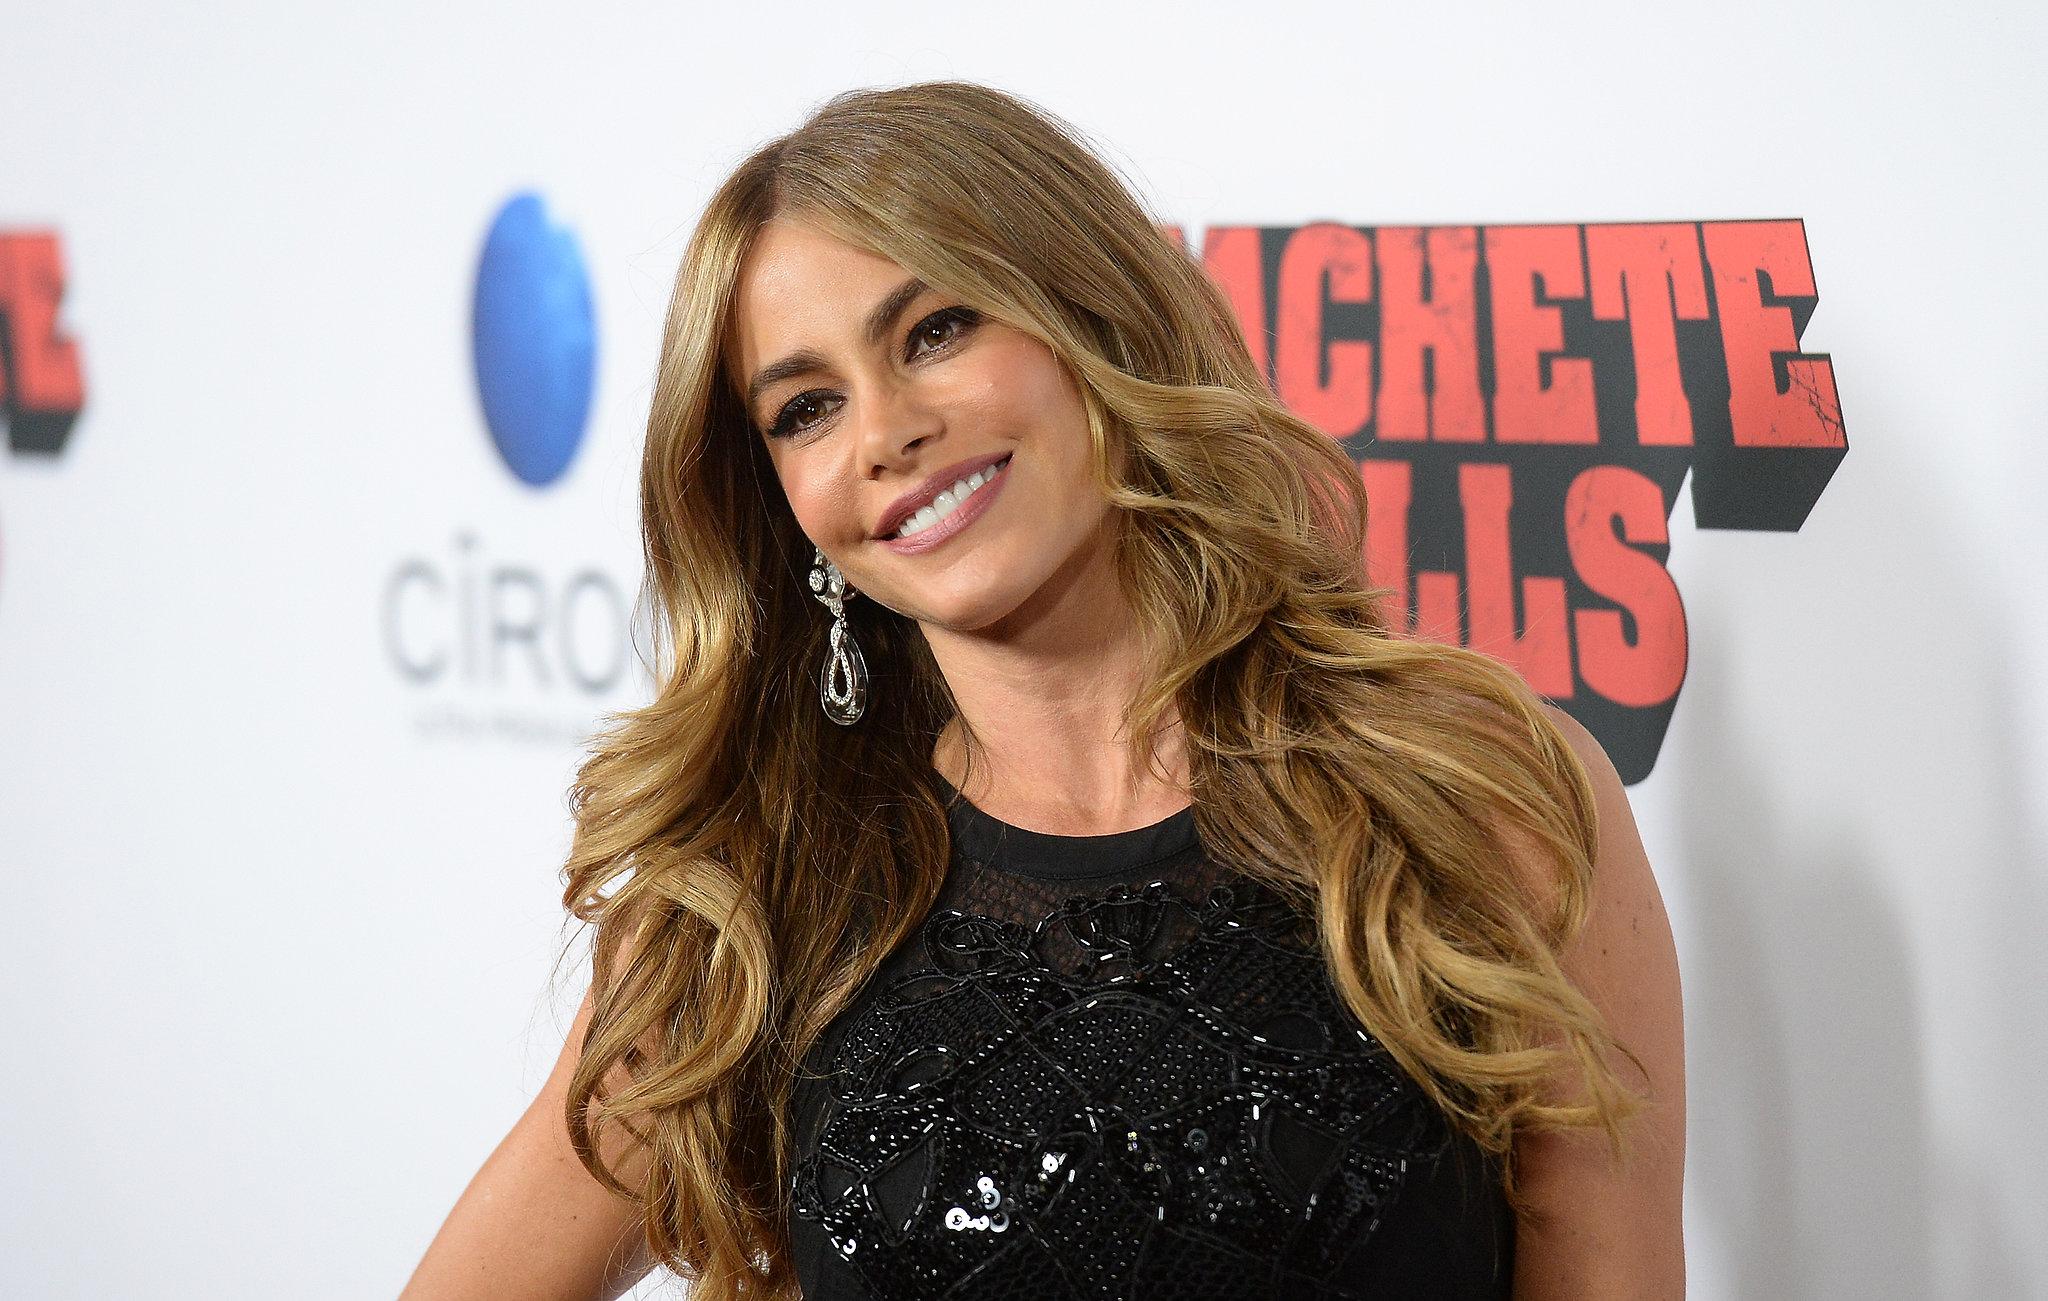 Que Fuego: Sofia Vergara Shows Love For Latinos During Her Big Premiere